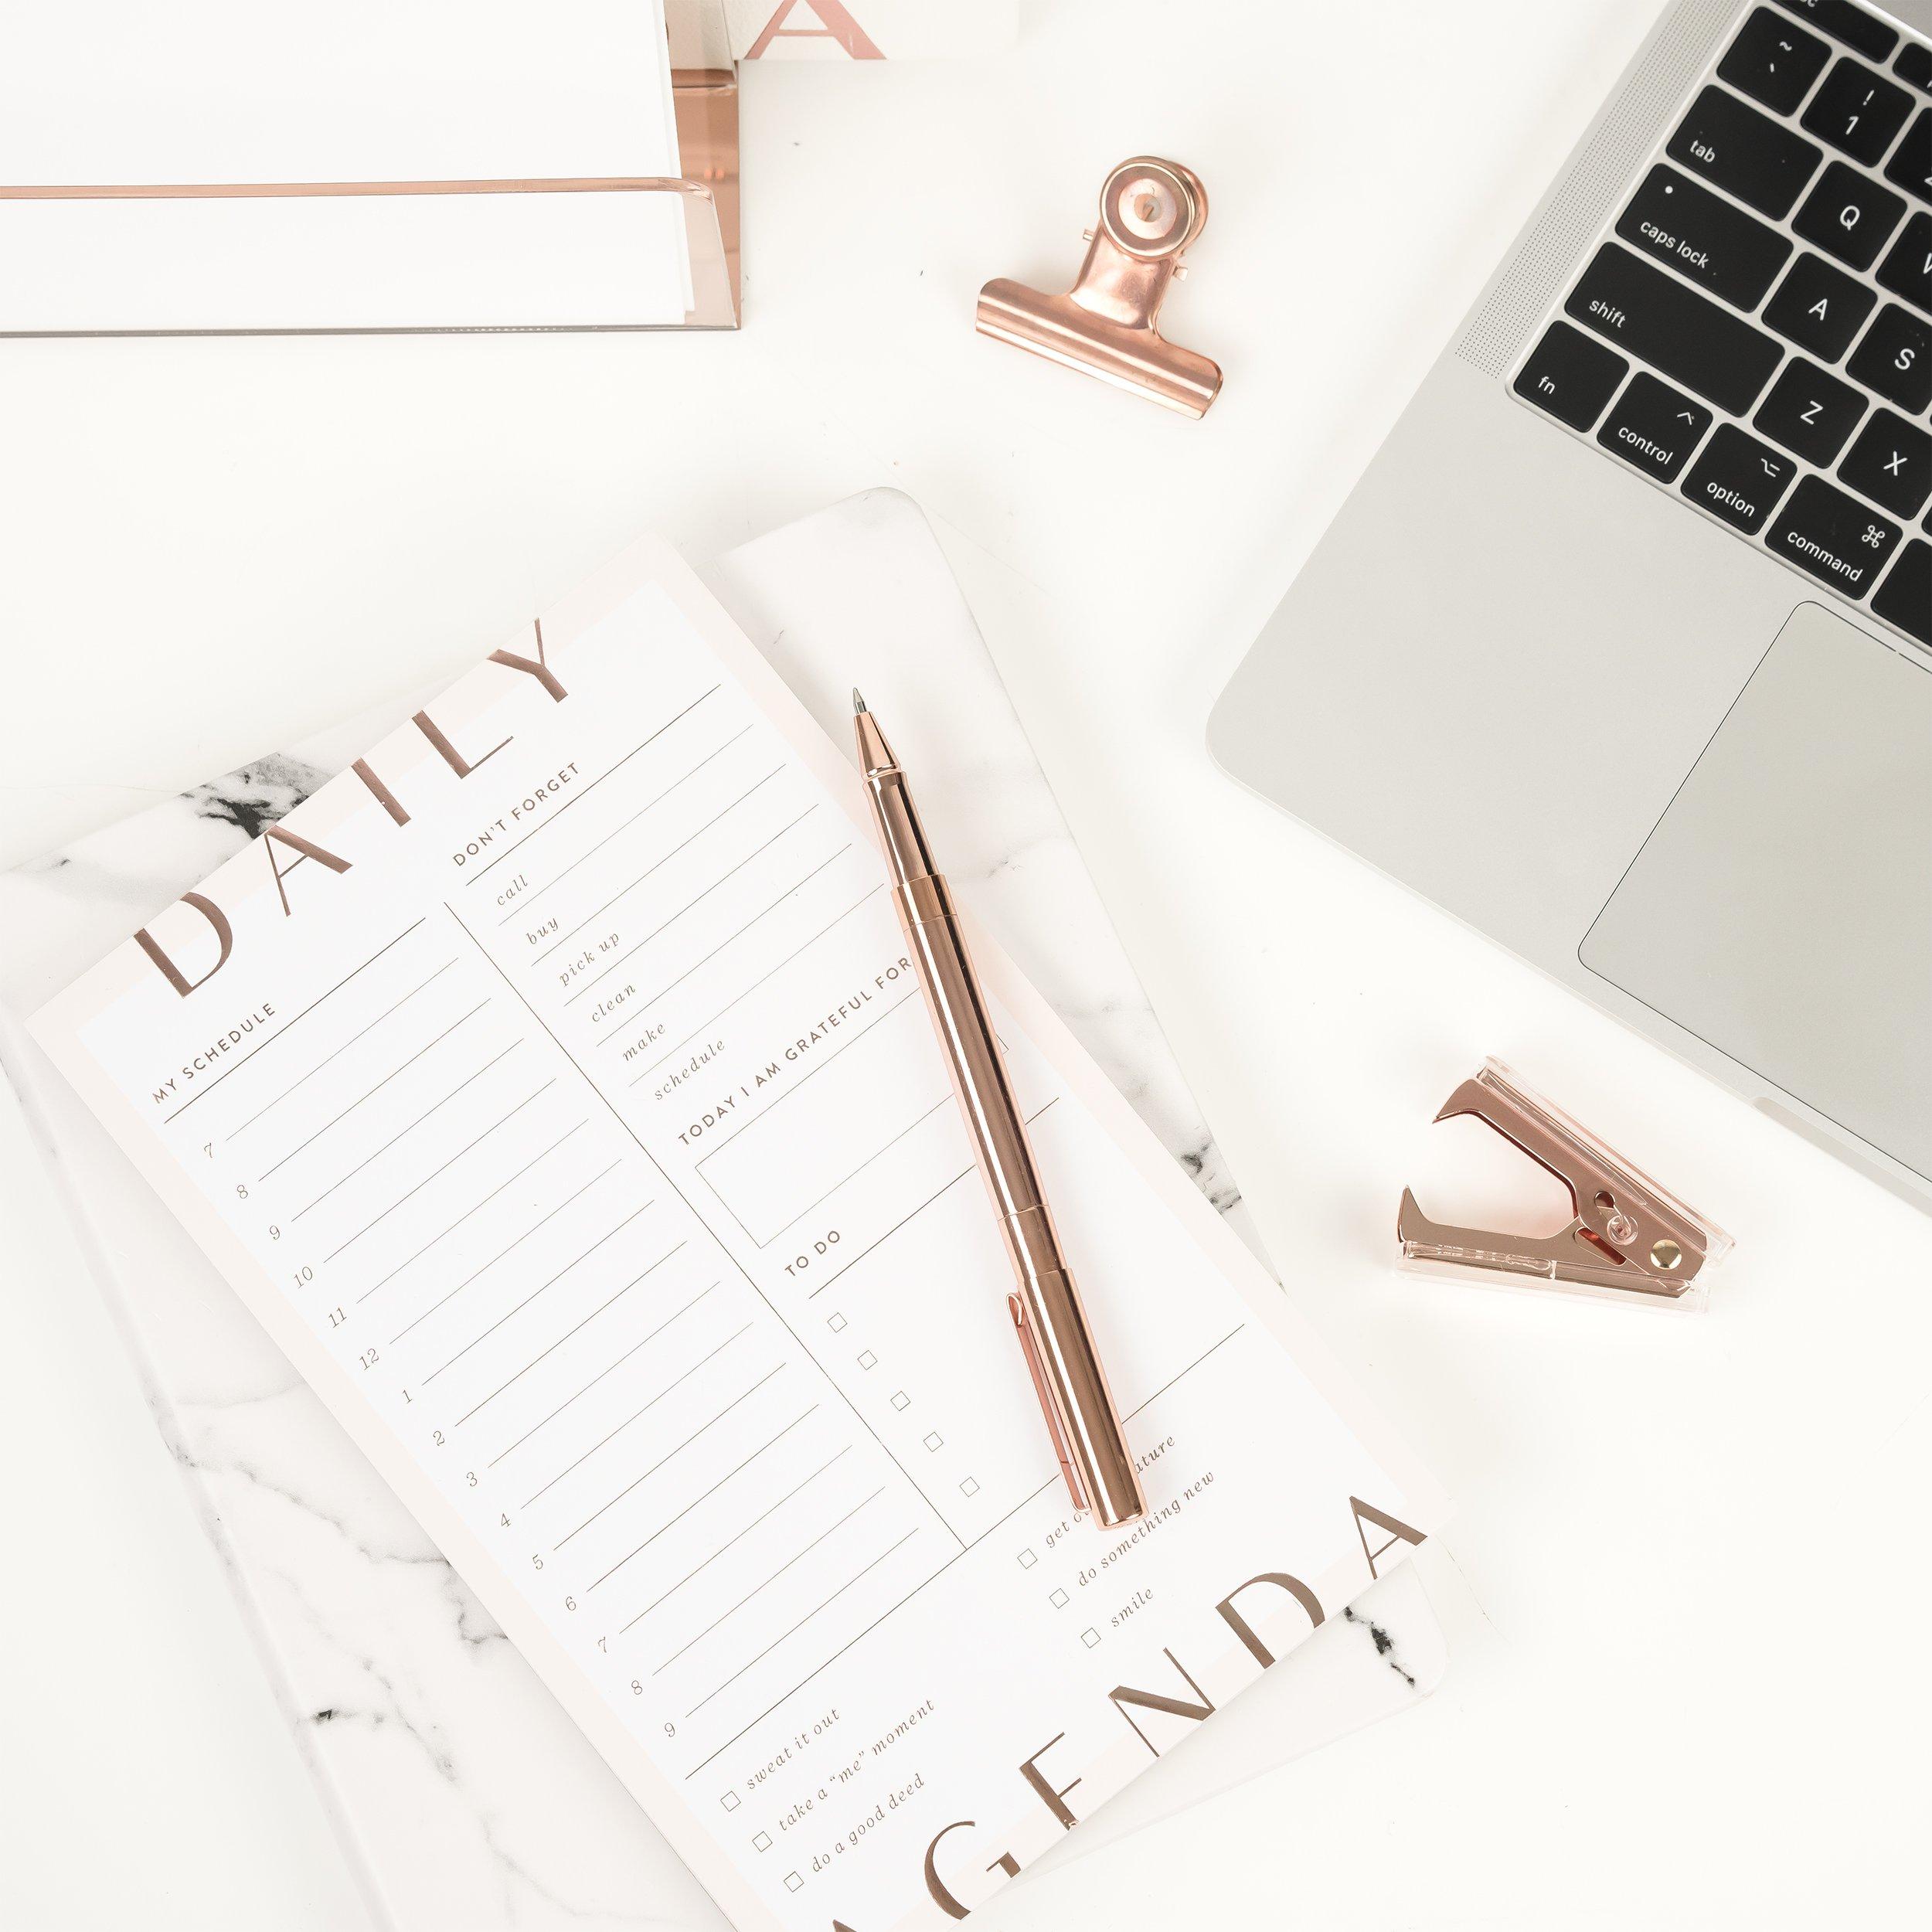 calendar, pen, clips and laptop for web design